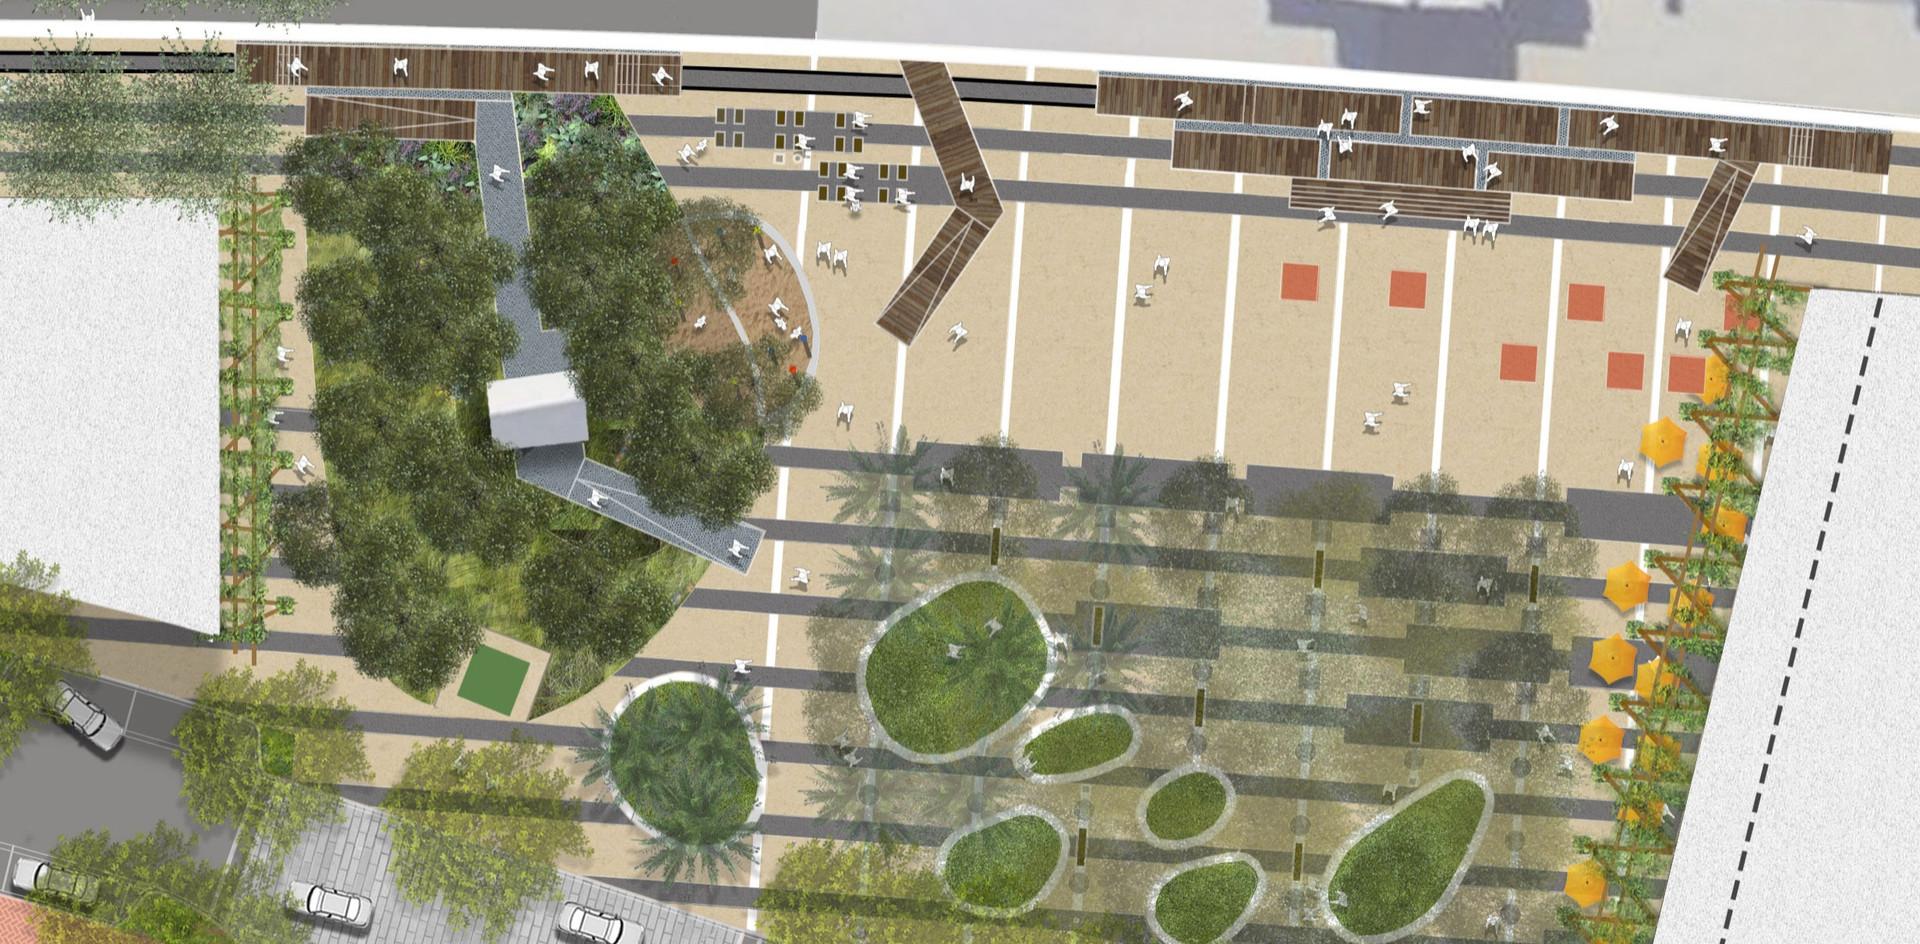 150527-Batavia-Landscape-Concept-Plan_No